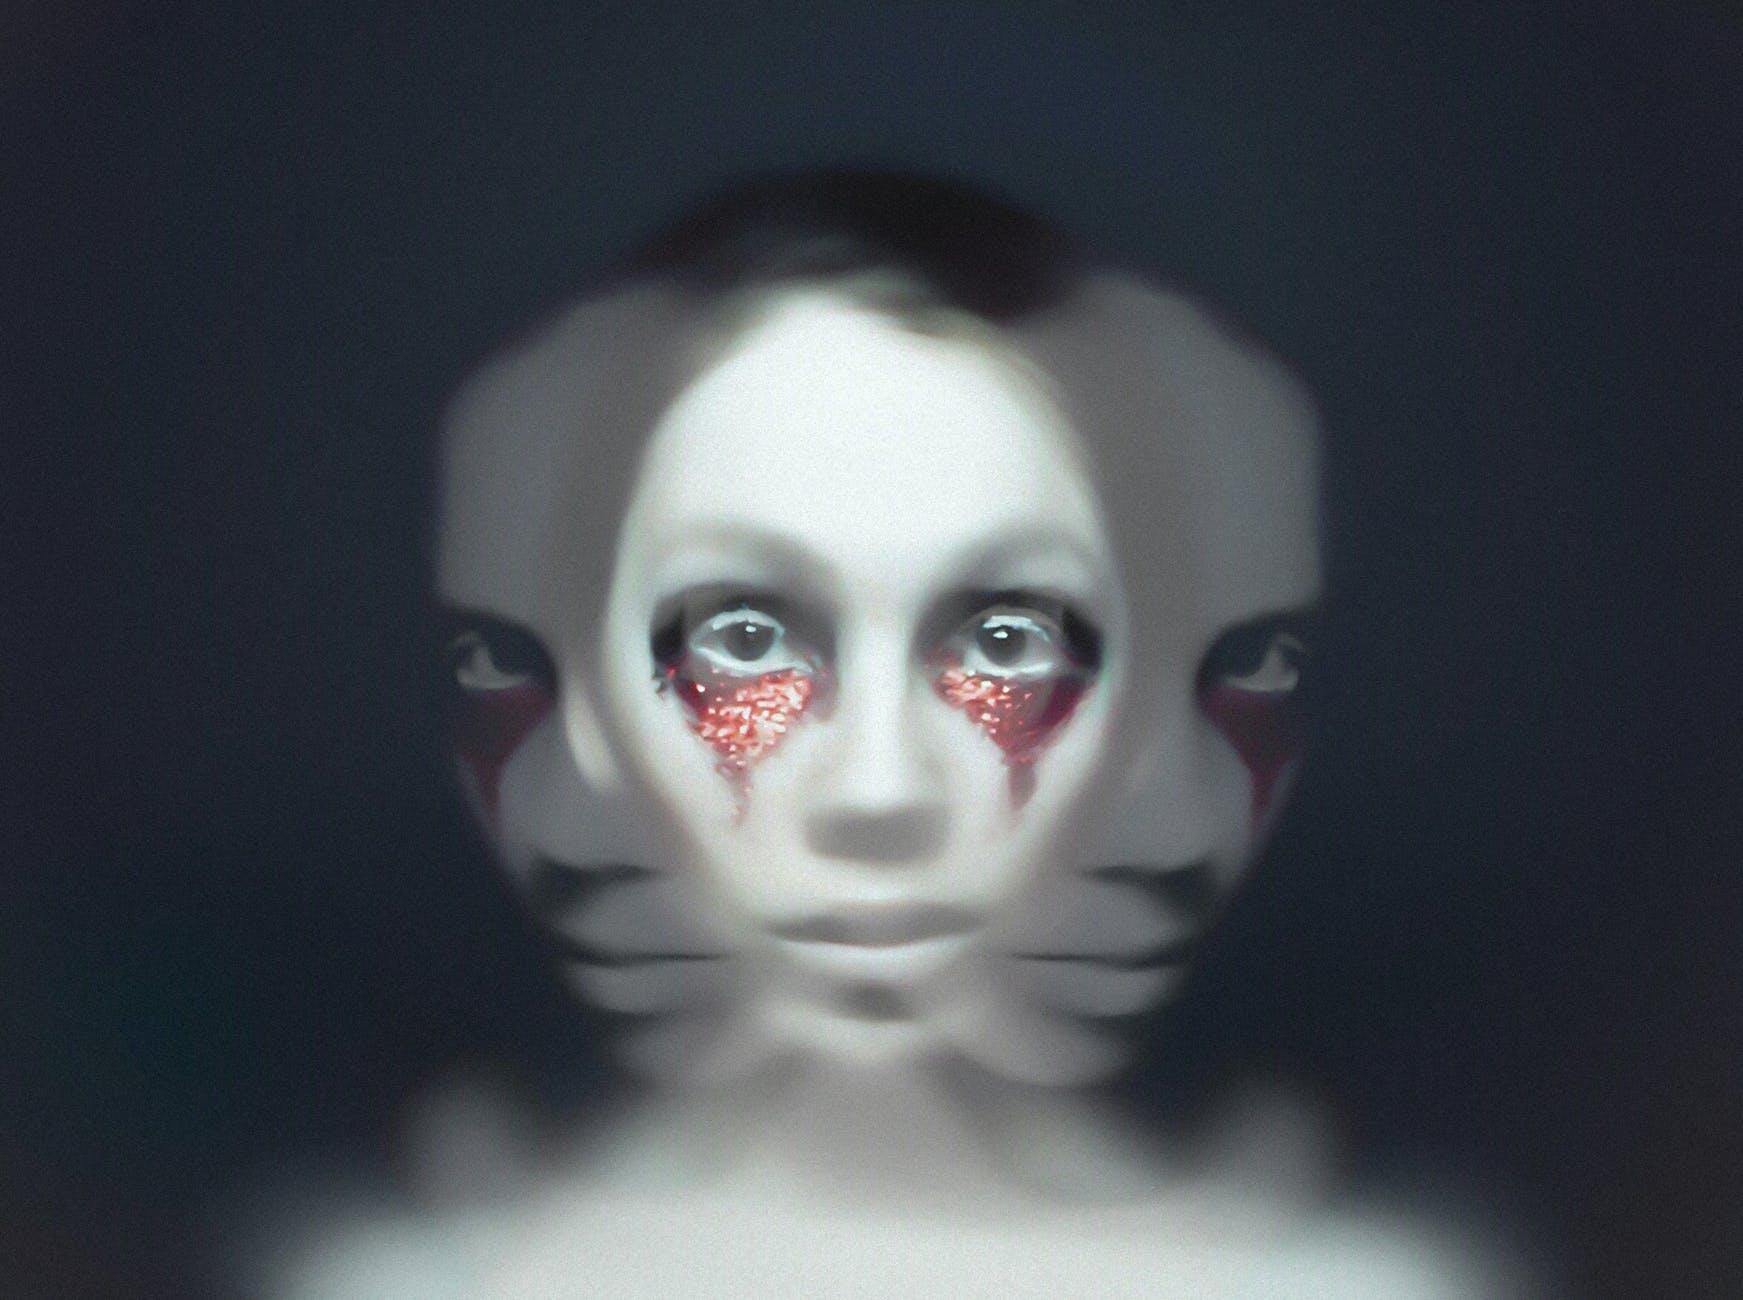 woman s face; spooky